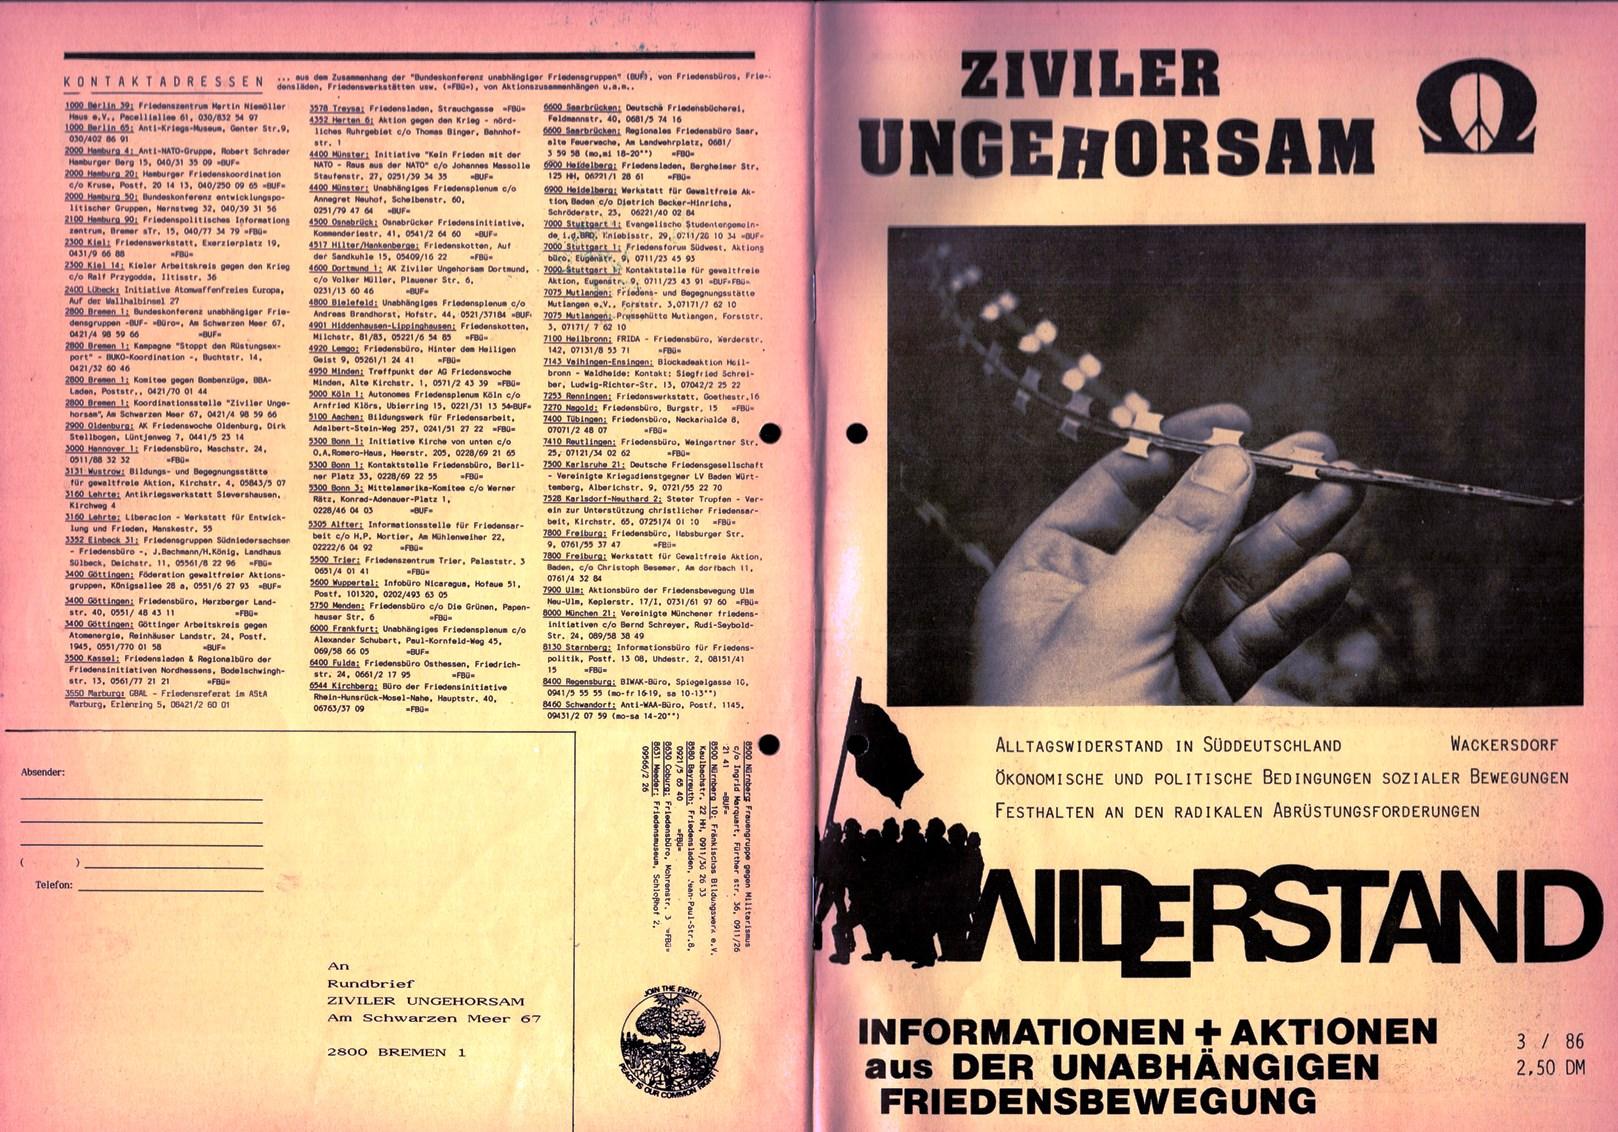 Ziviler_Ungehorsam_1986_003_001